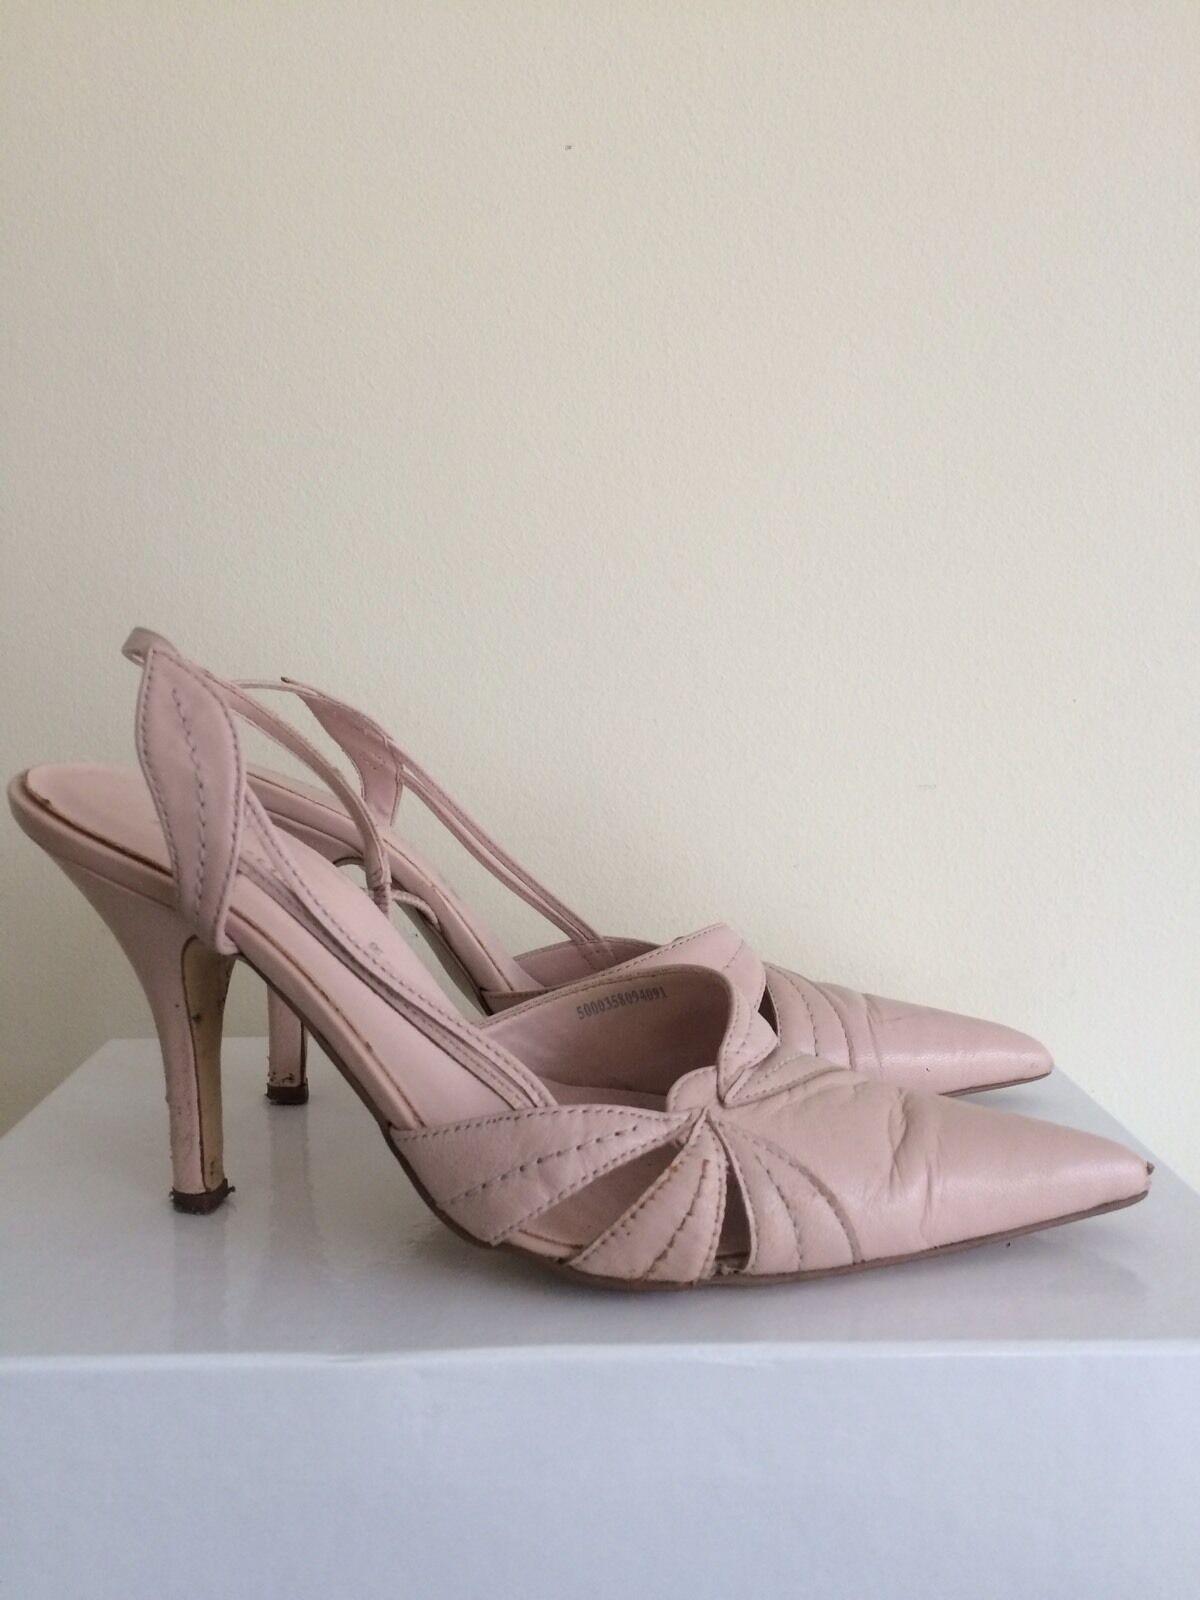 F&F Women's Pastel Pink Slingback Size Heels Sandals. Size Slingback 682f1d